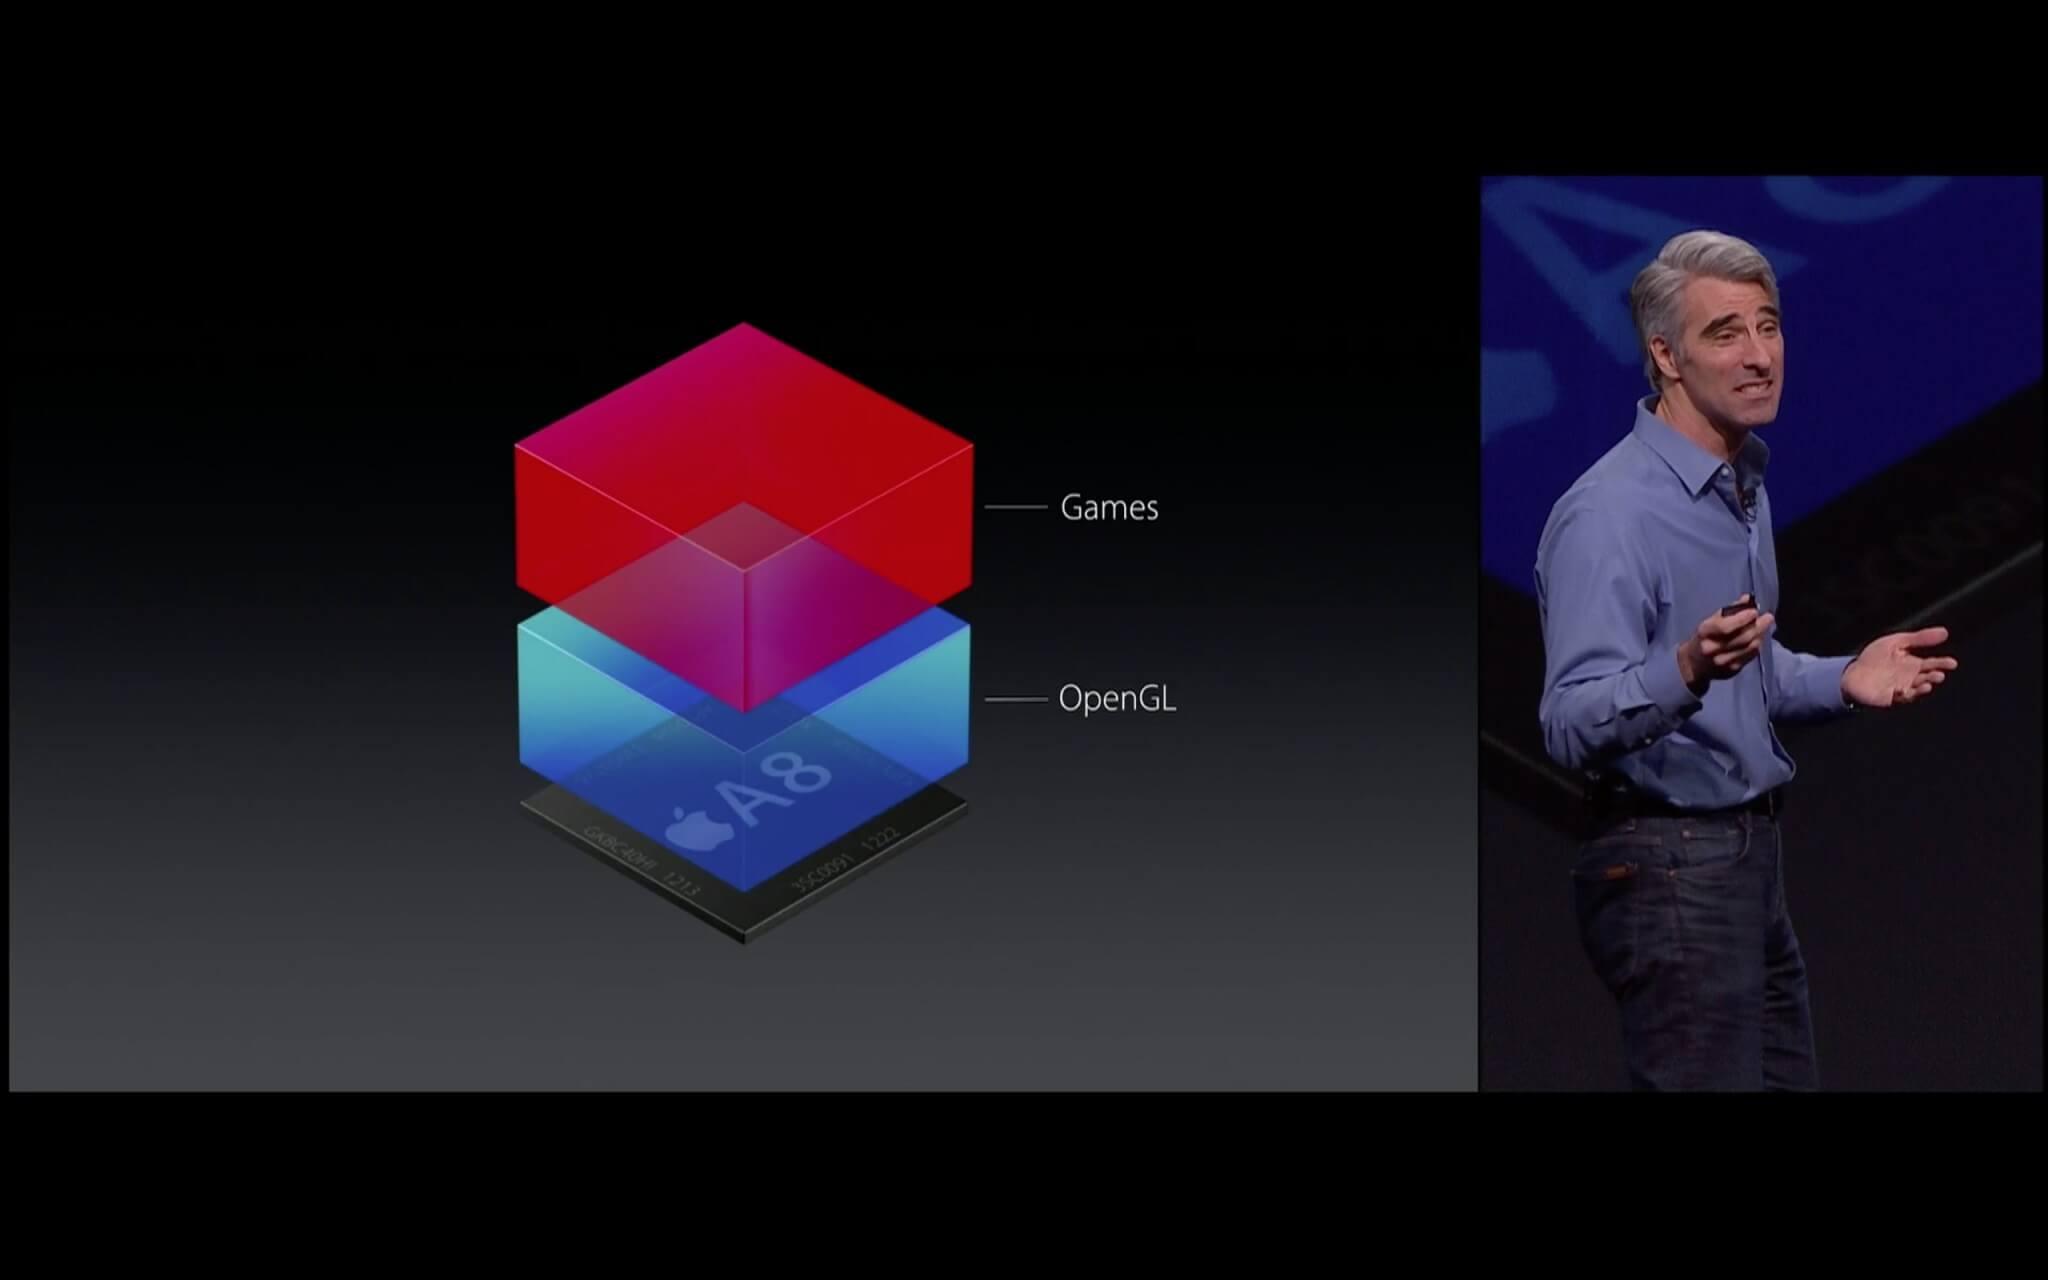 OpenGL frisst derzeit viel Ressourcen (Bildrechte: Apple)